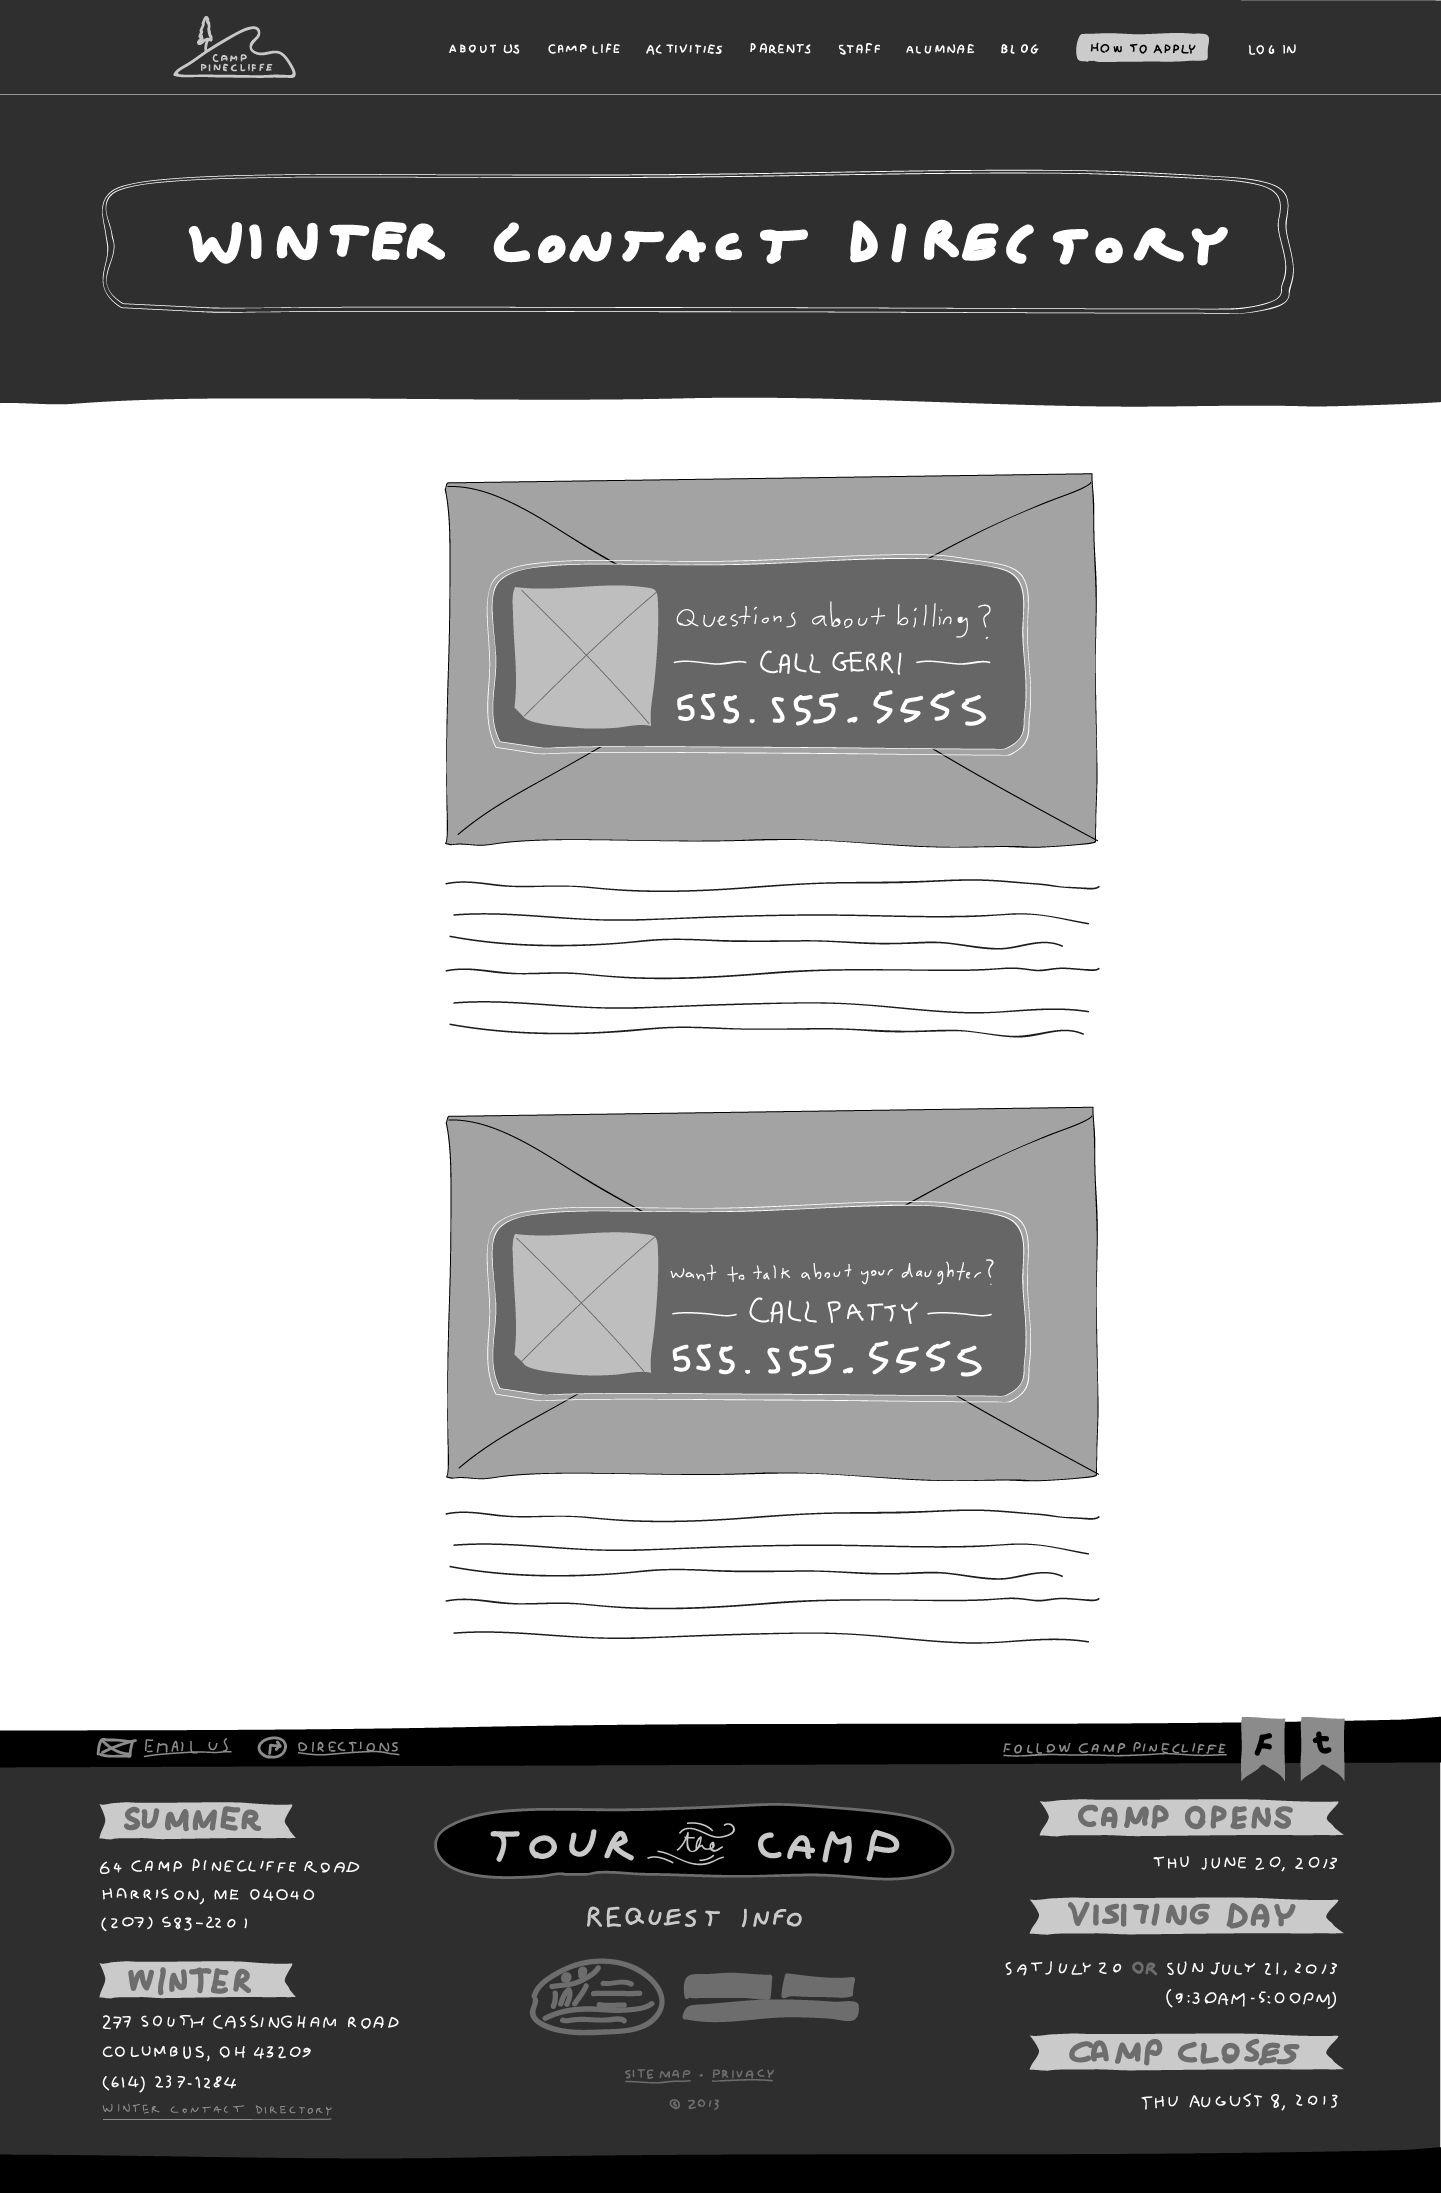 custom website redesign 2 contact directory sketch wireframe